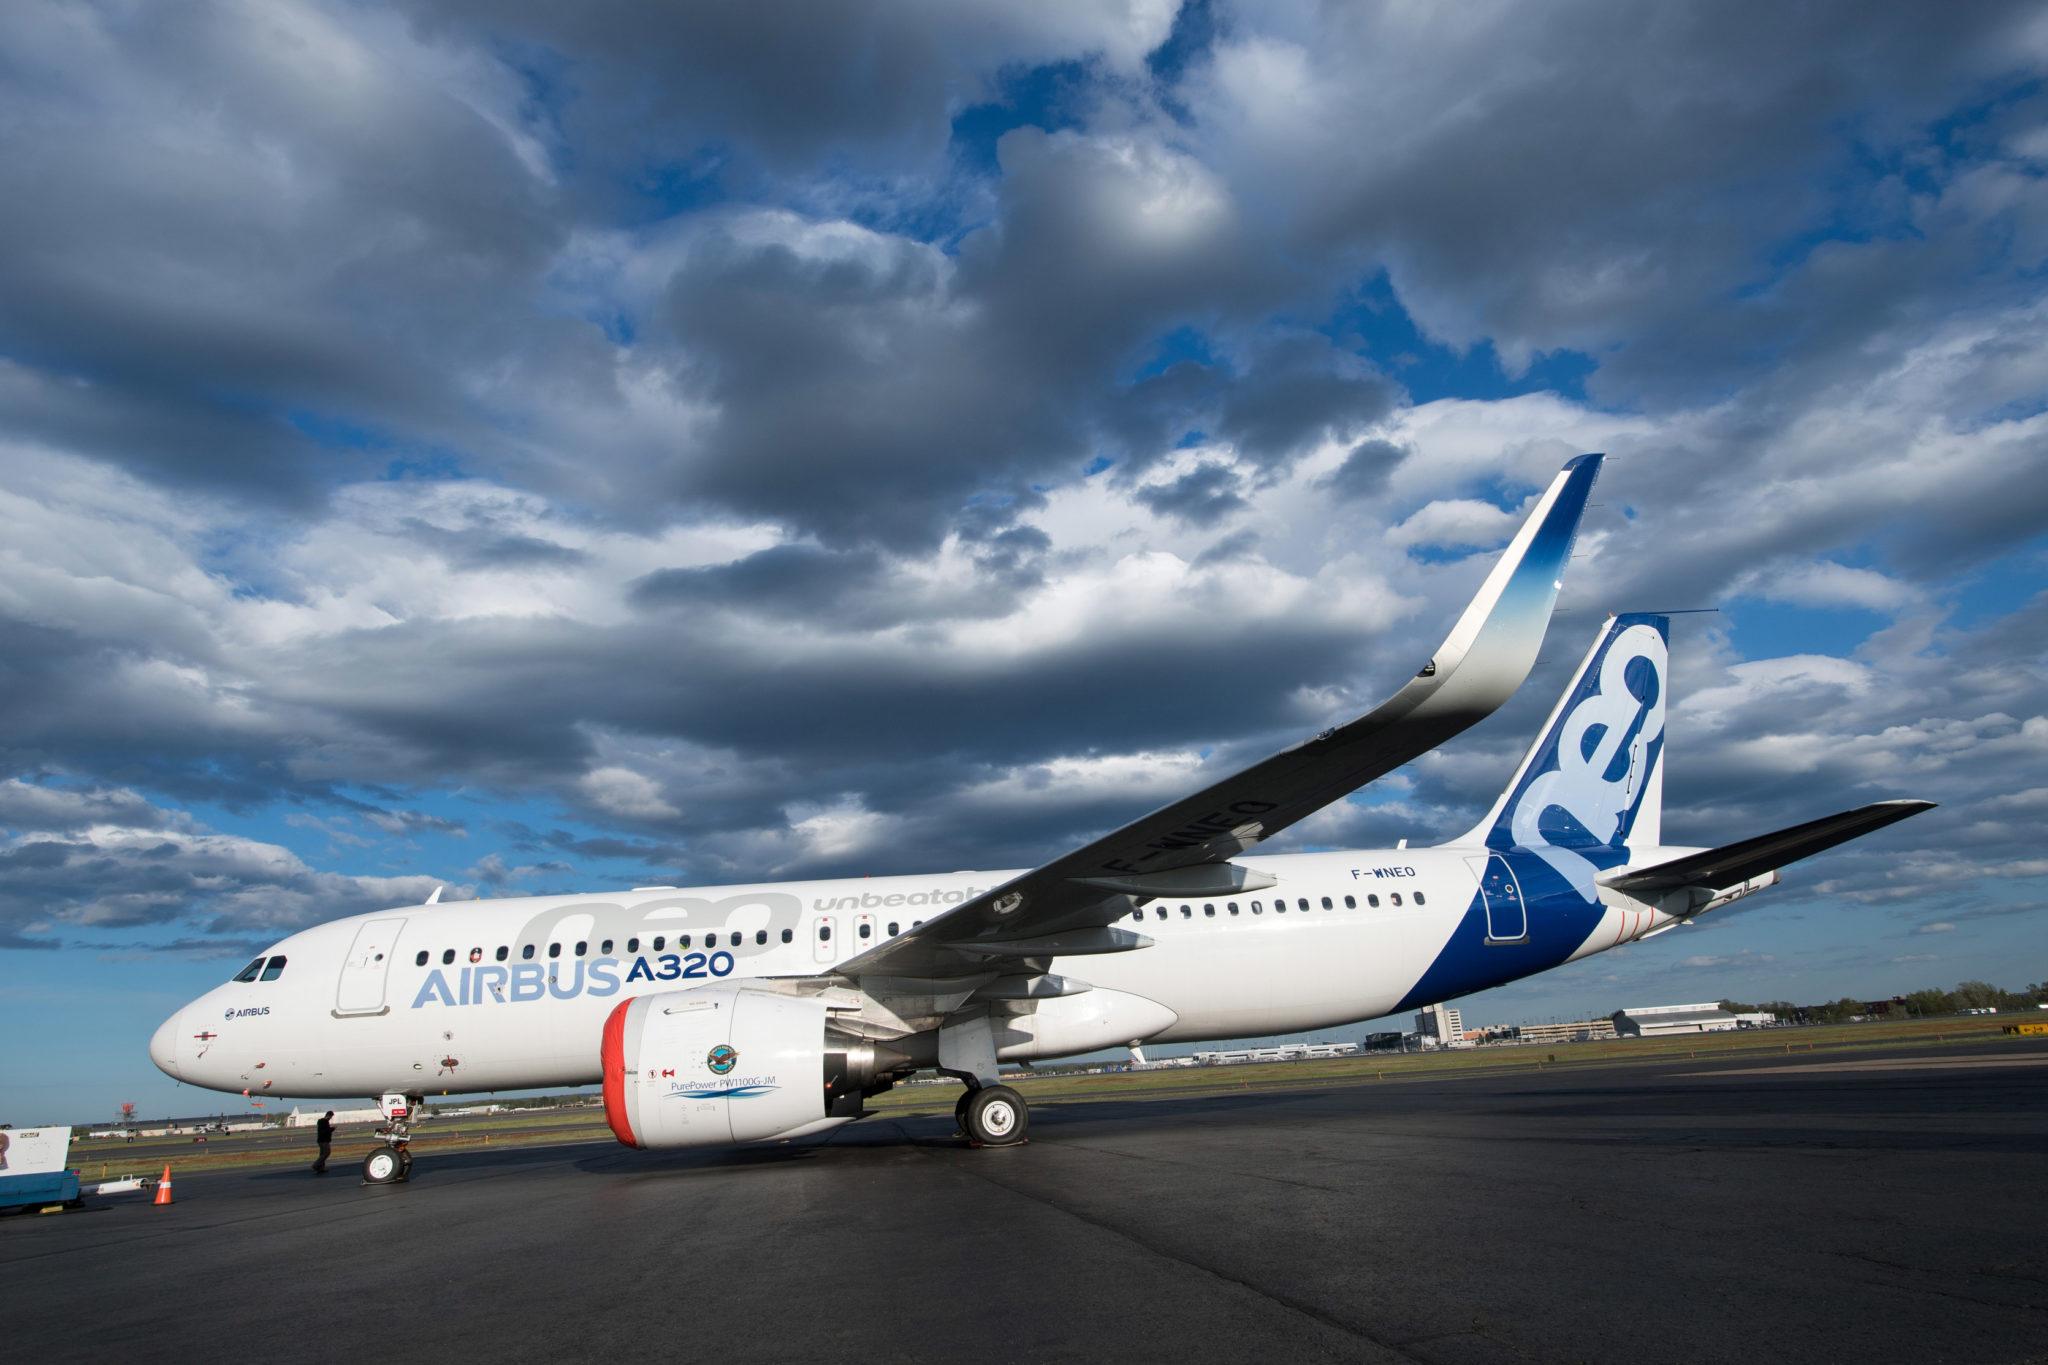 Airbus 320NEO with PW1100G-JM engine. Image: Pratt & Whitney